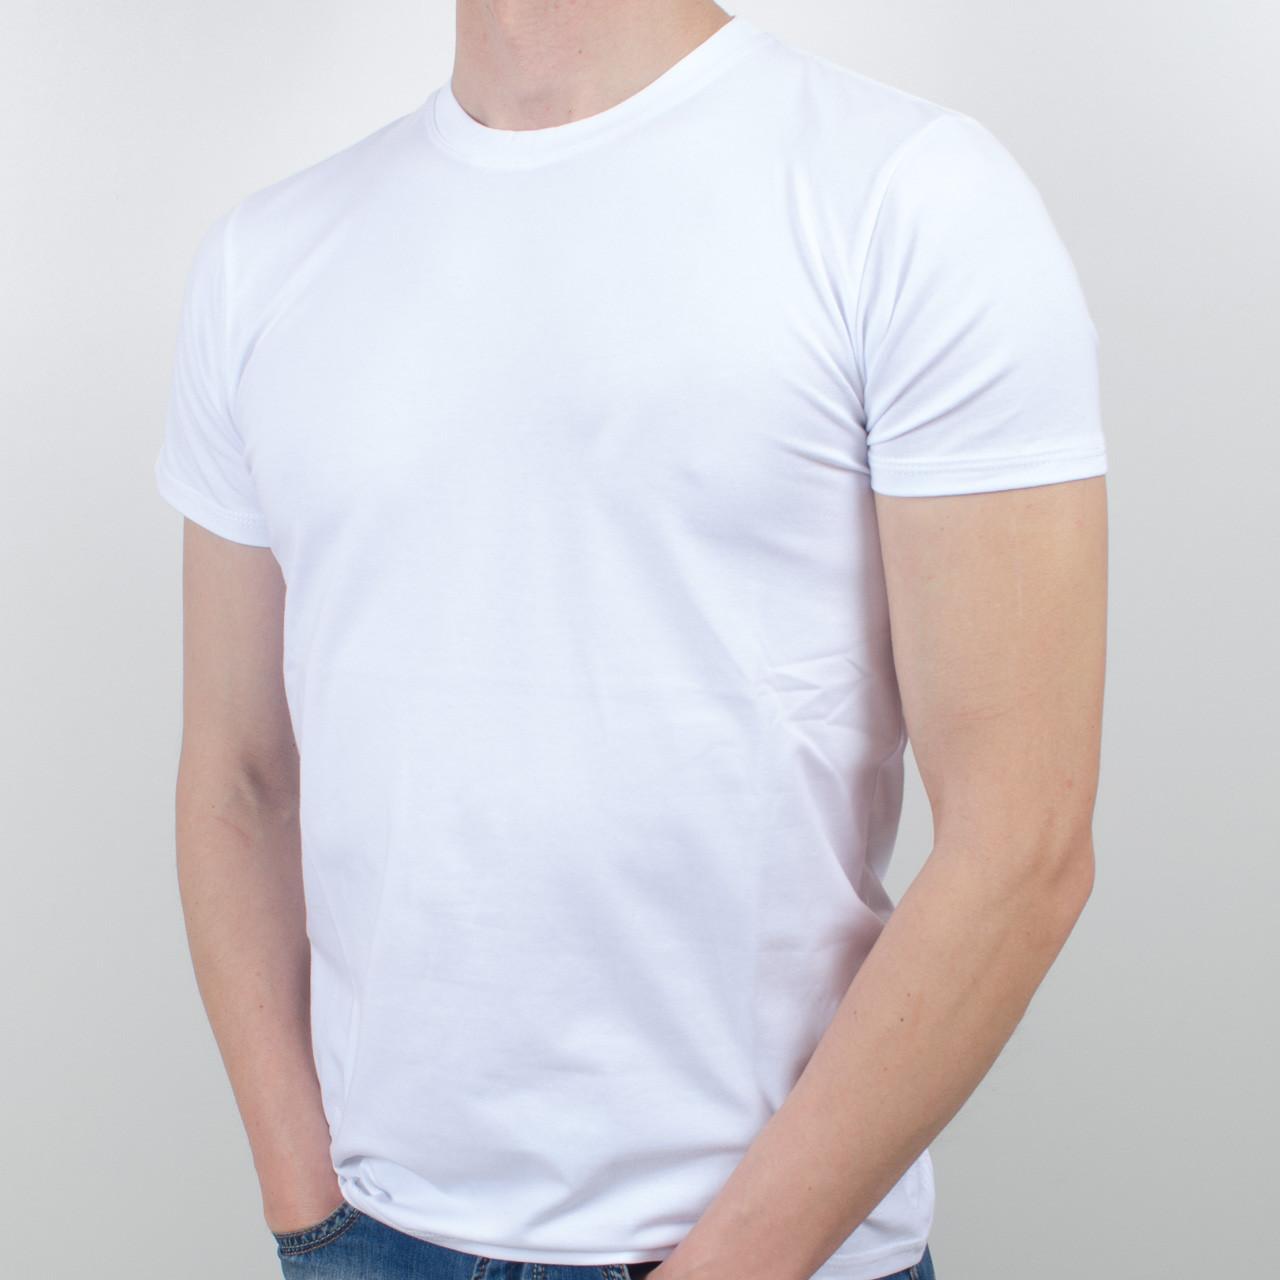 Футболка мужская однотонная  (0Г01), Белый